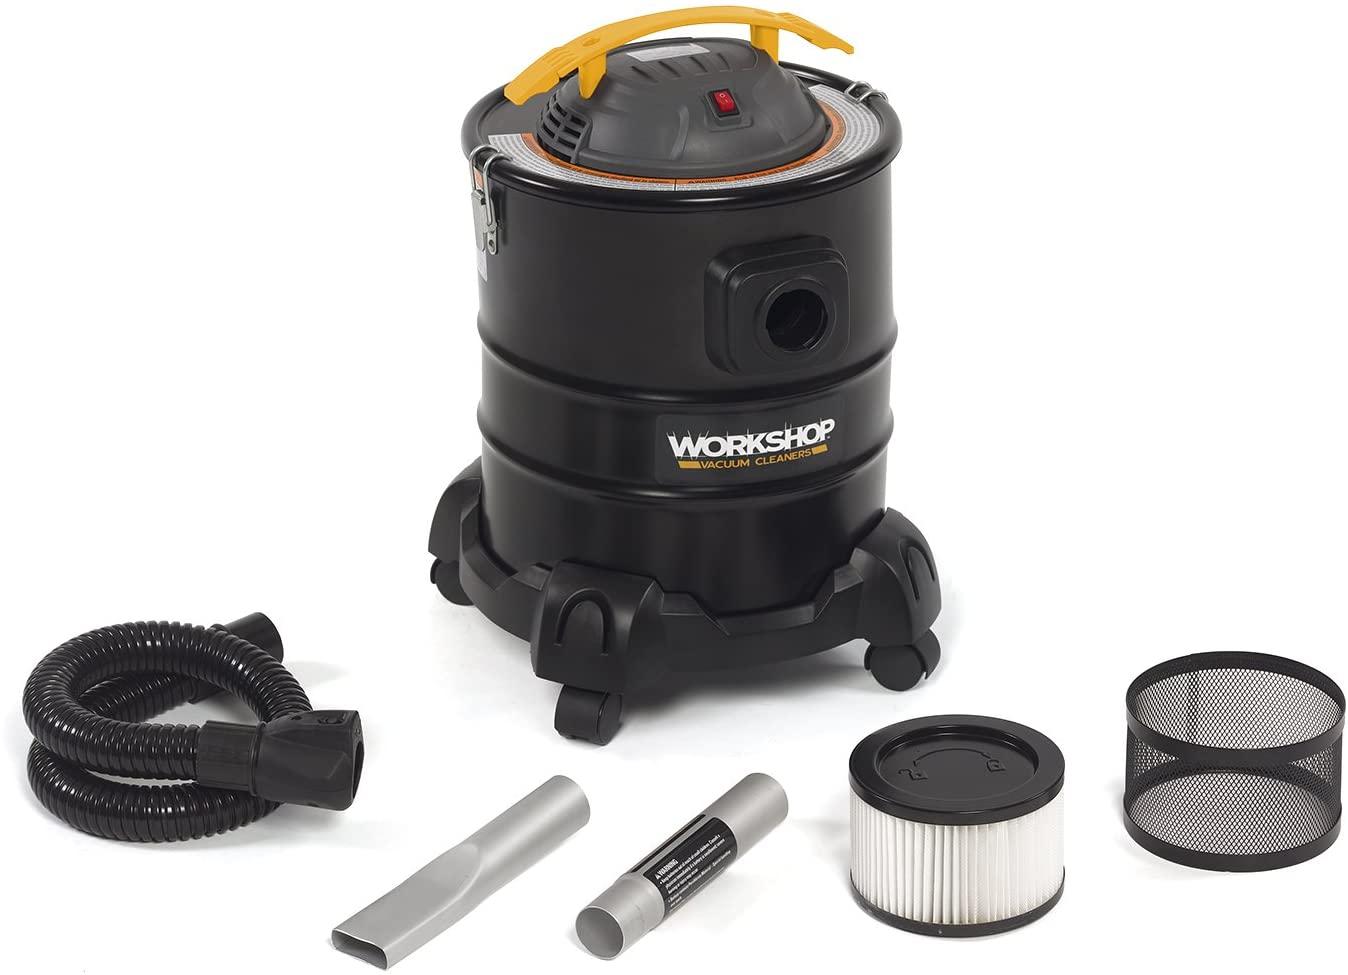 WORKSHOP Ash Vacuum Cleaner